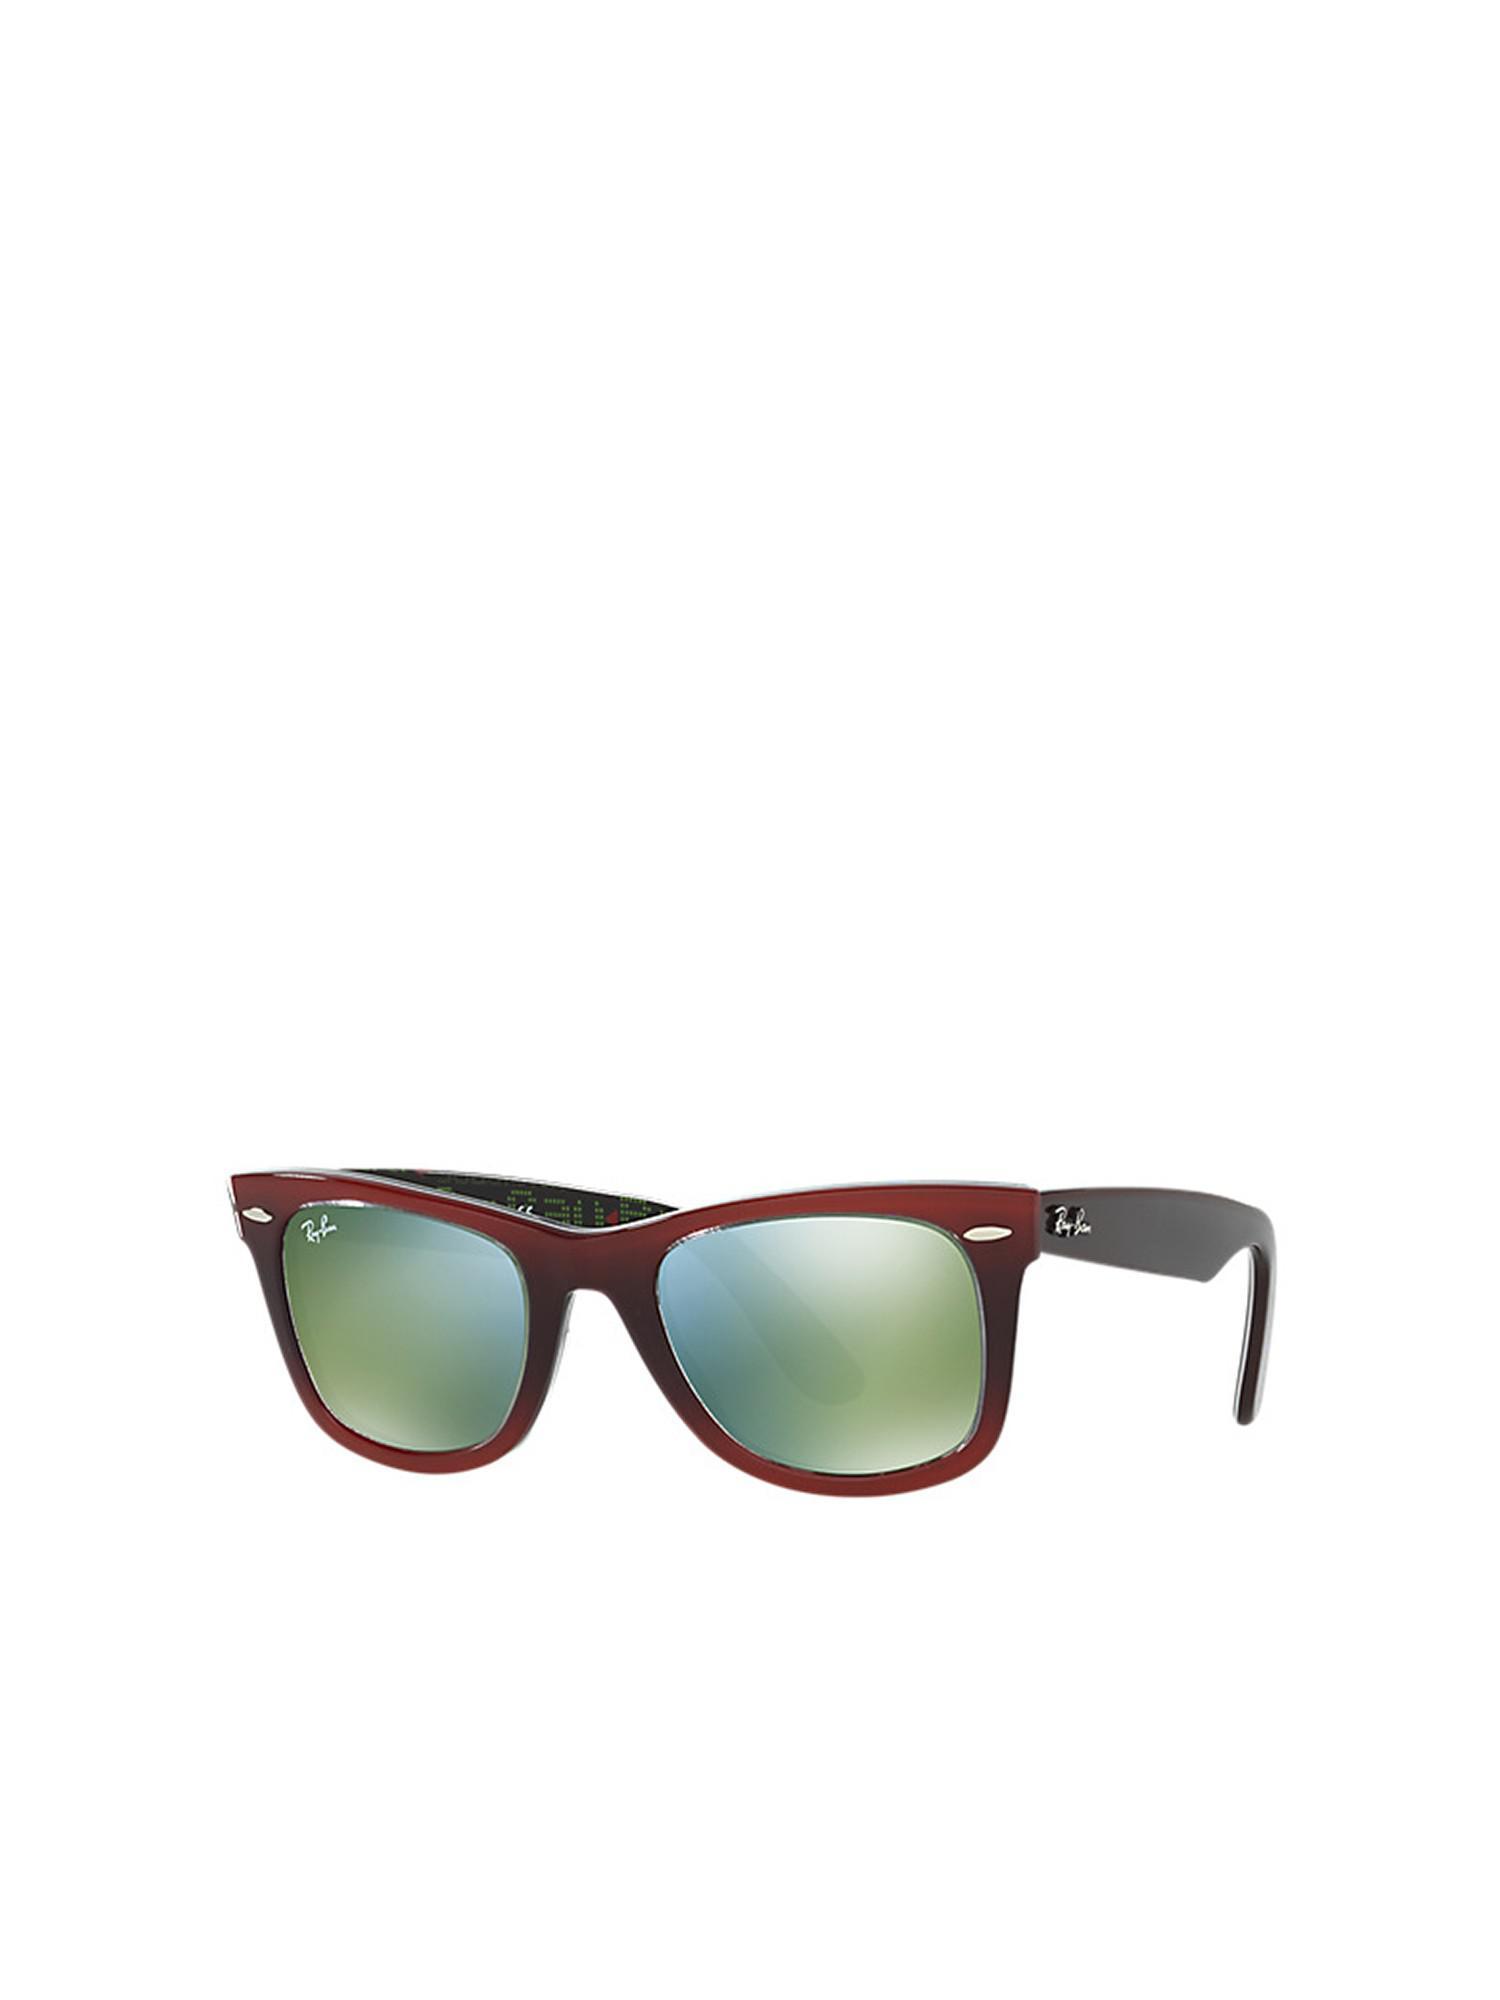 0588c232a0 Ray-Ban - Green Original Wayfarer rb2140 12022x 50 - Lyst. View fullscreen